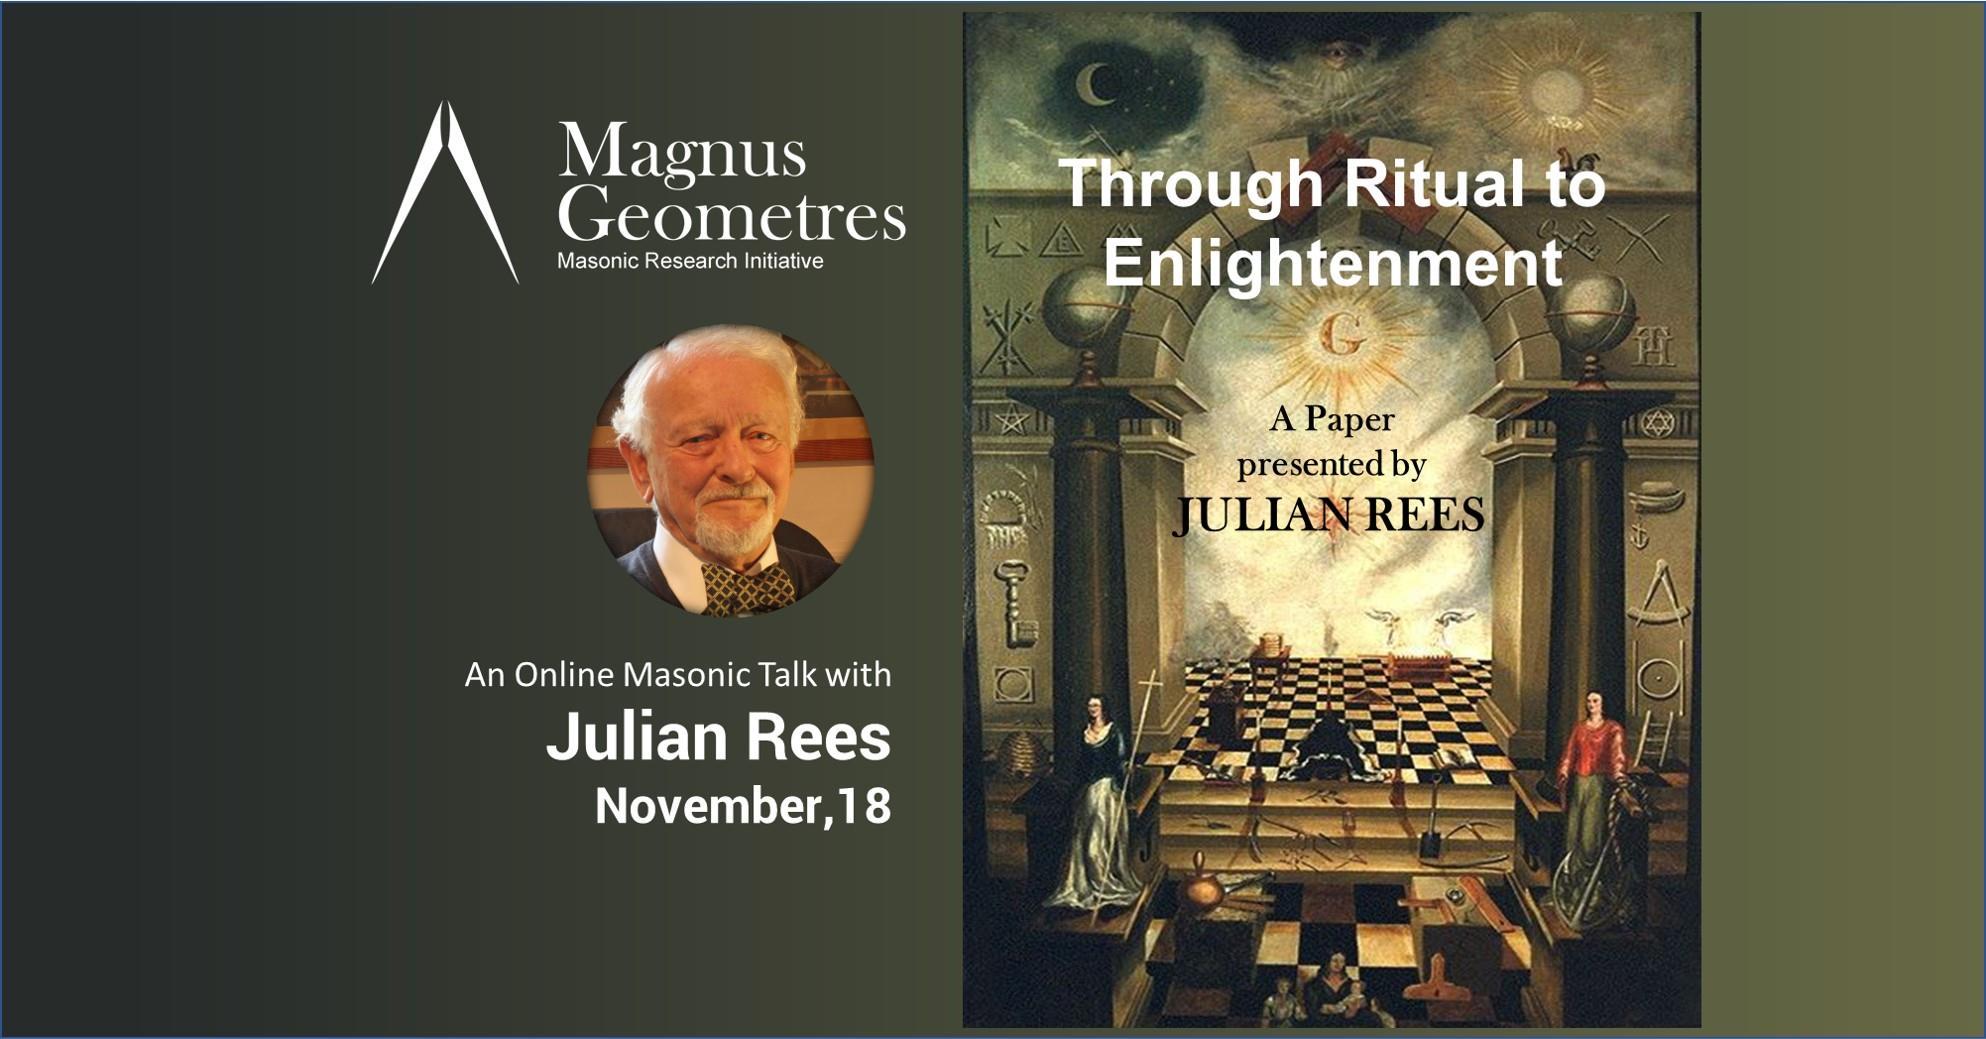 Julian rees Through Ritual to Enlightenment by Julian Rees